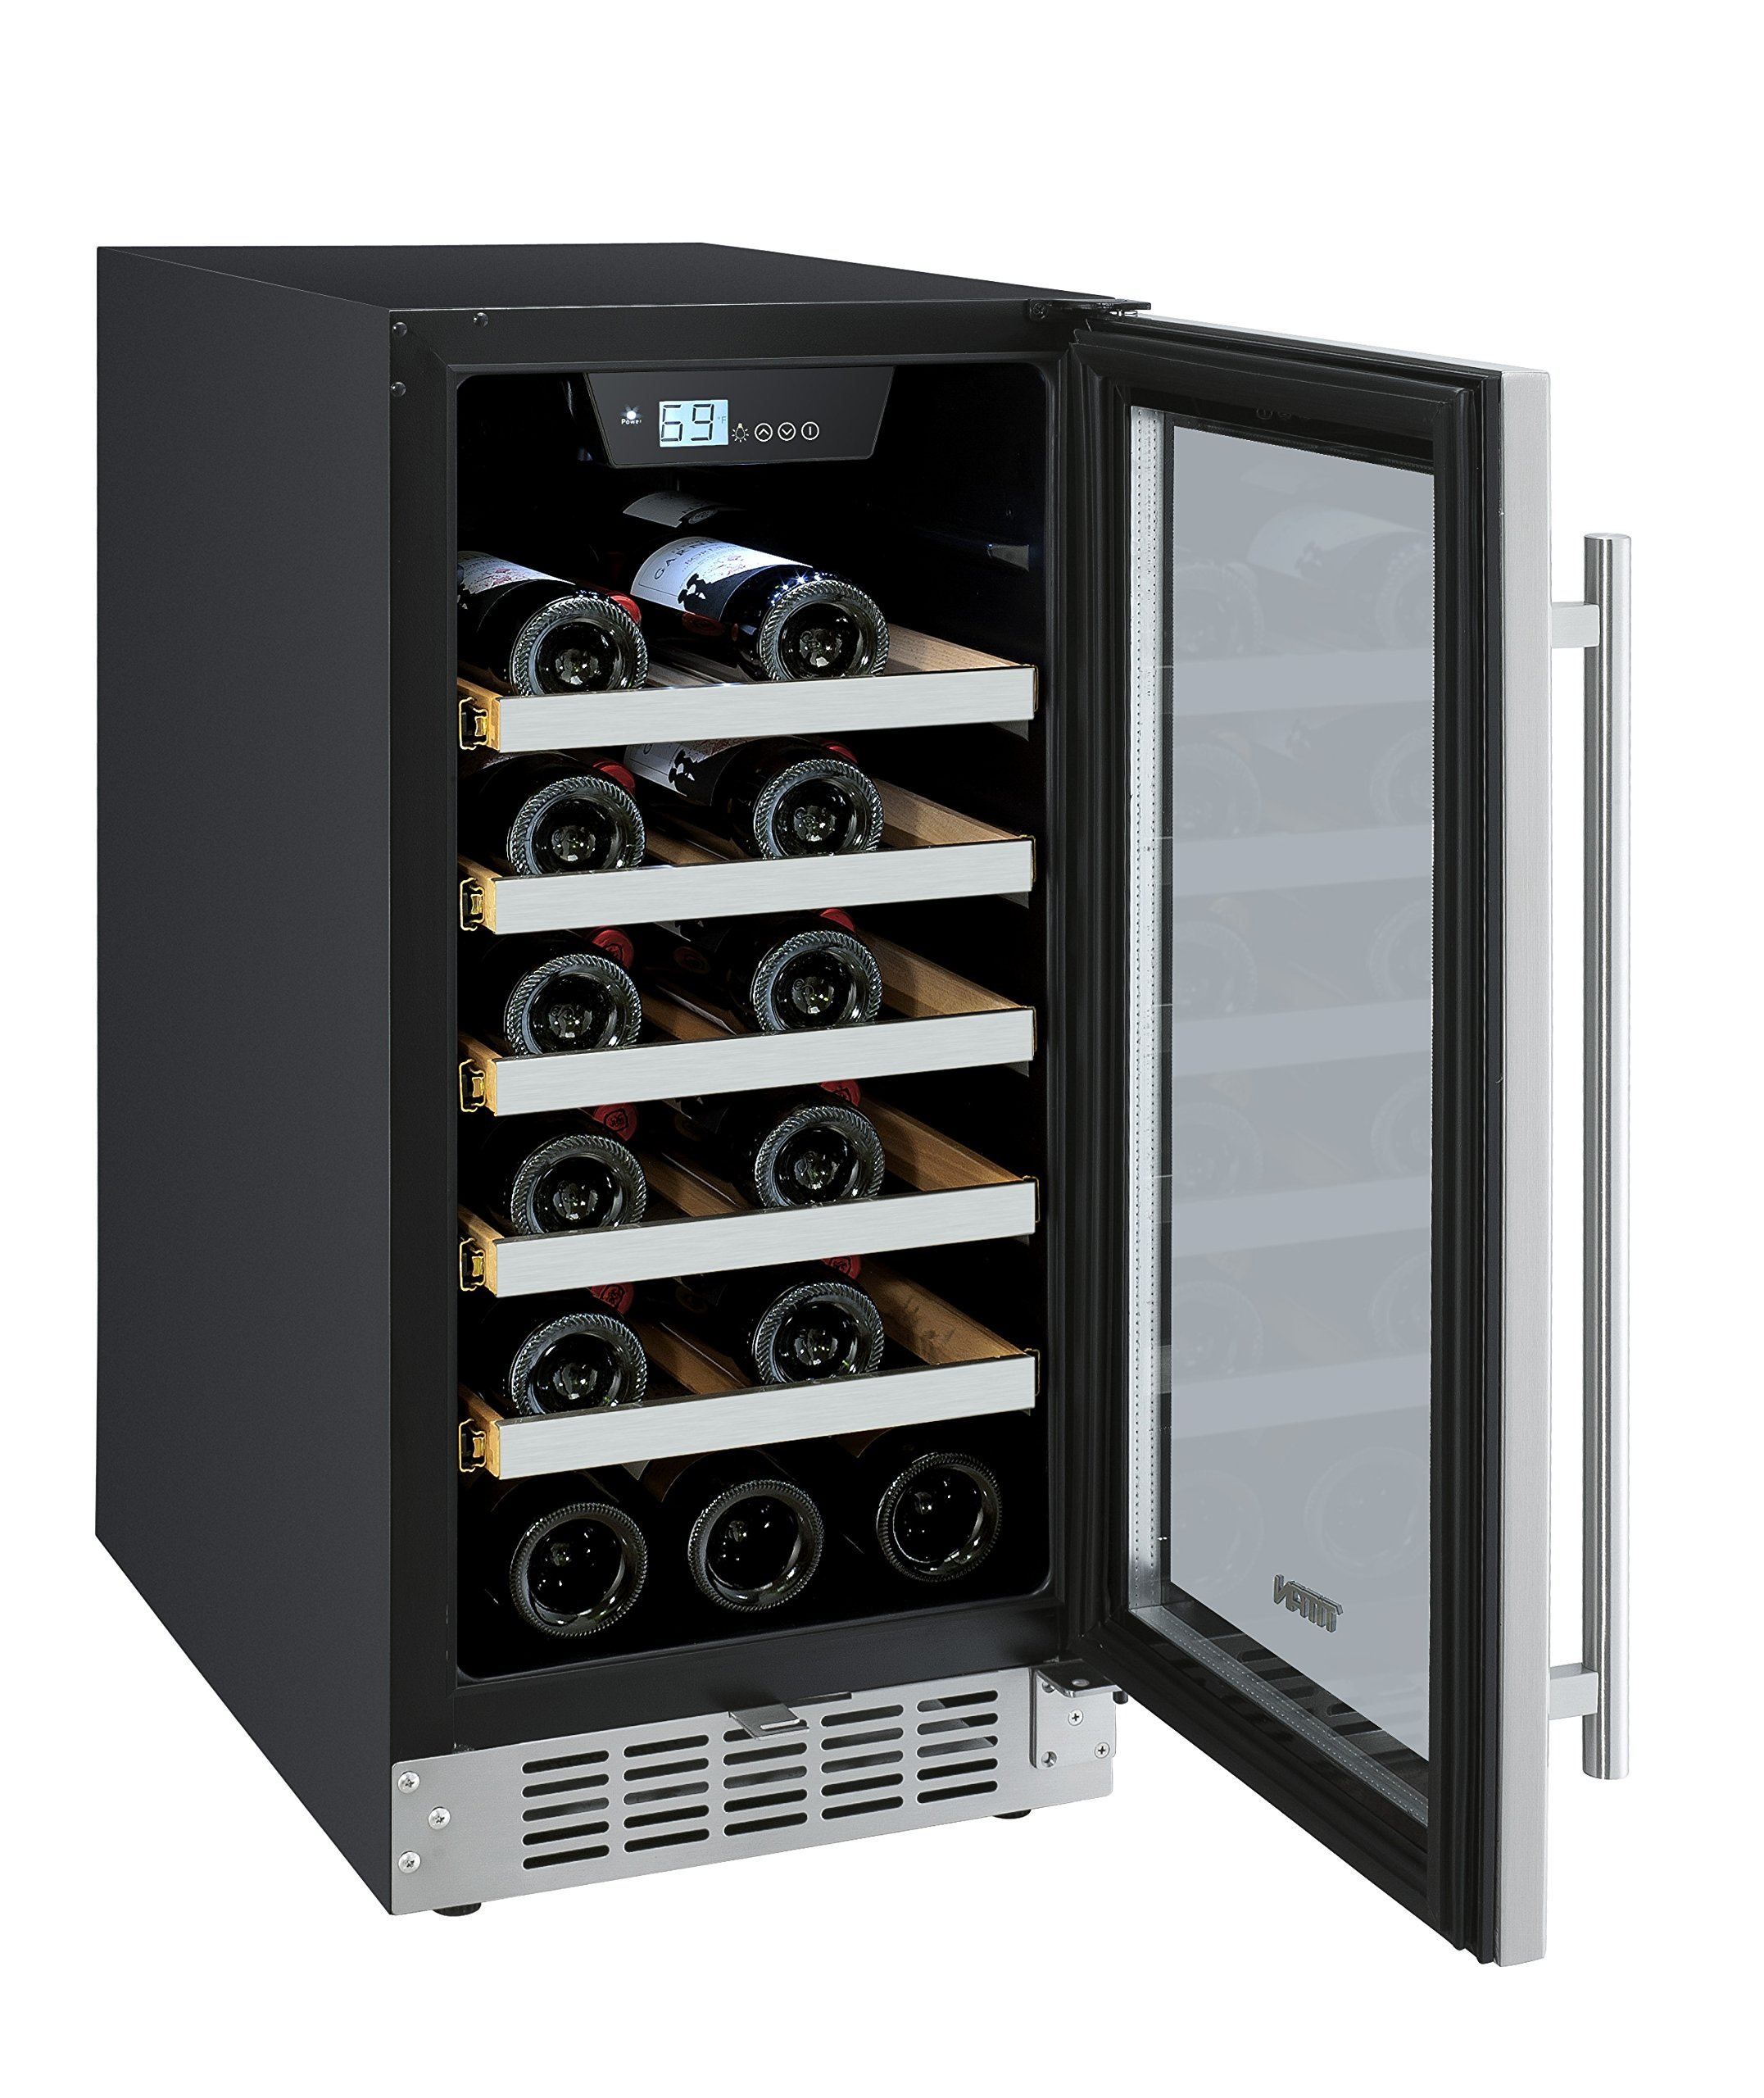 Titan TT-CWC1525SZ 25 Bottle SEAMLESS Stainless Steel Wine Cooler